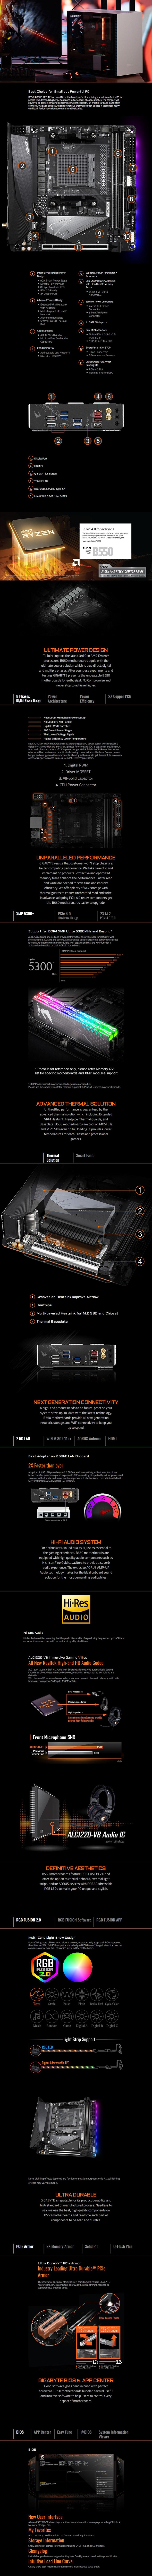 gigabyte-b550i-aorus-pro-ax-am4-miniitx-motherboard-ac35557-8.jpg